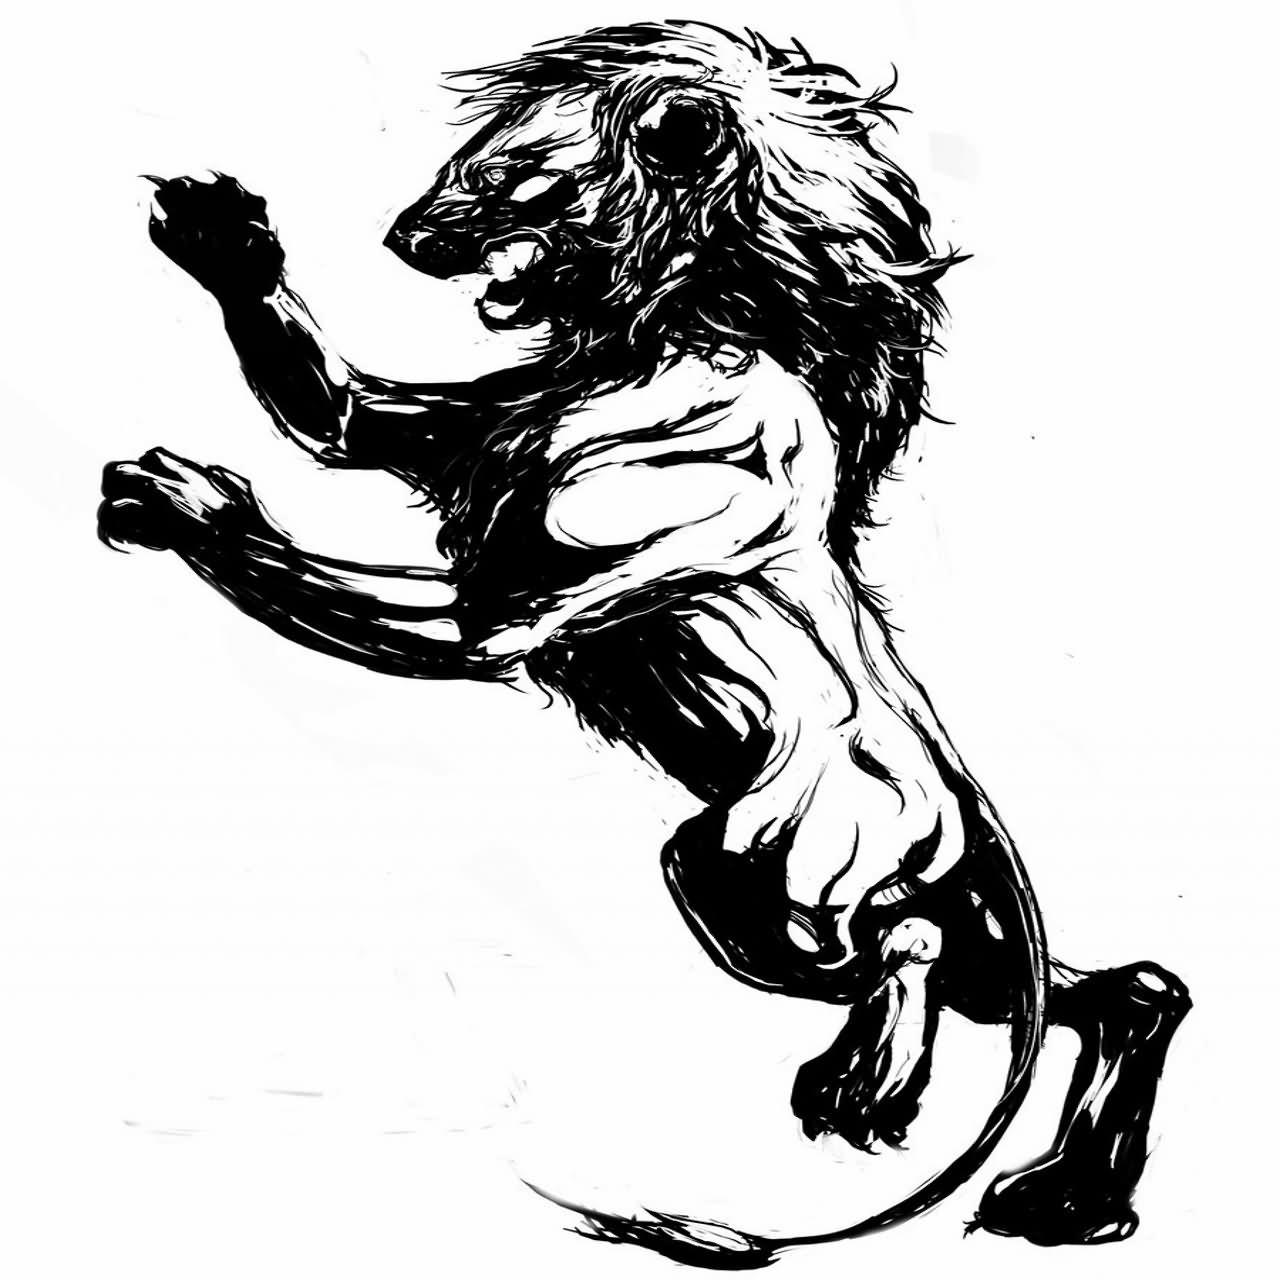 b7b5f3c0b Freehand climbing lion tattoo sketch by TGM